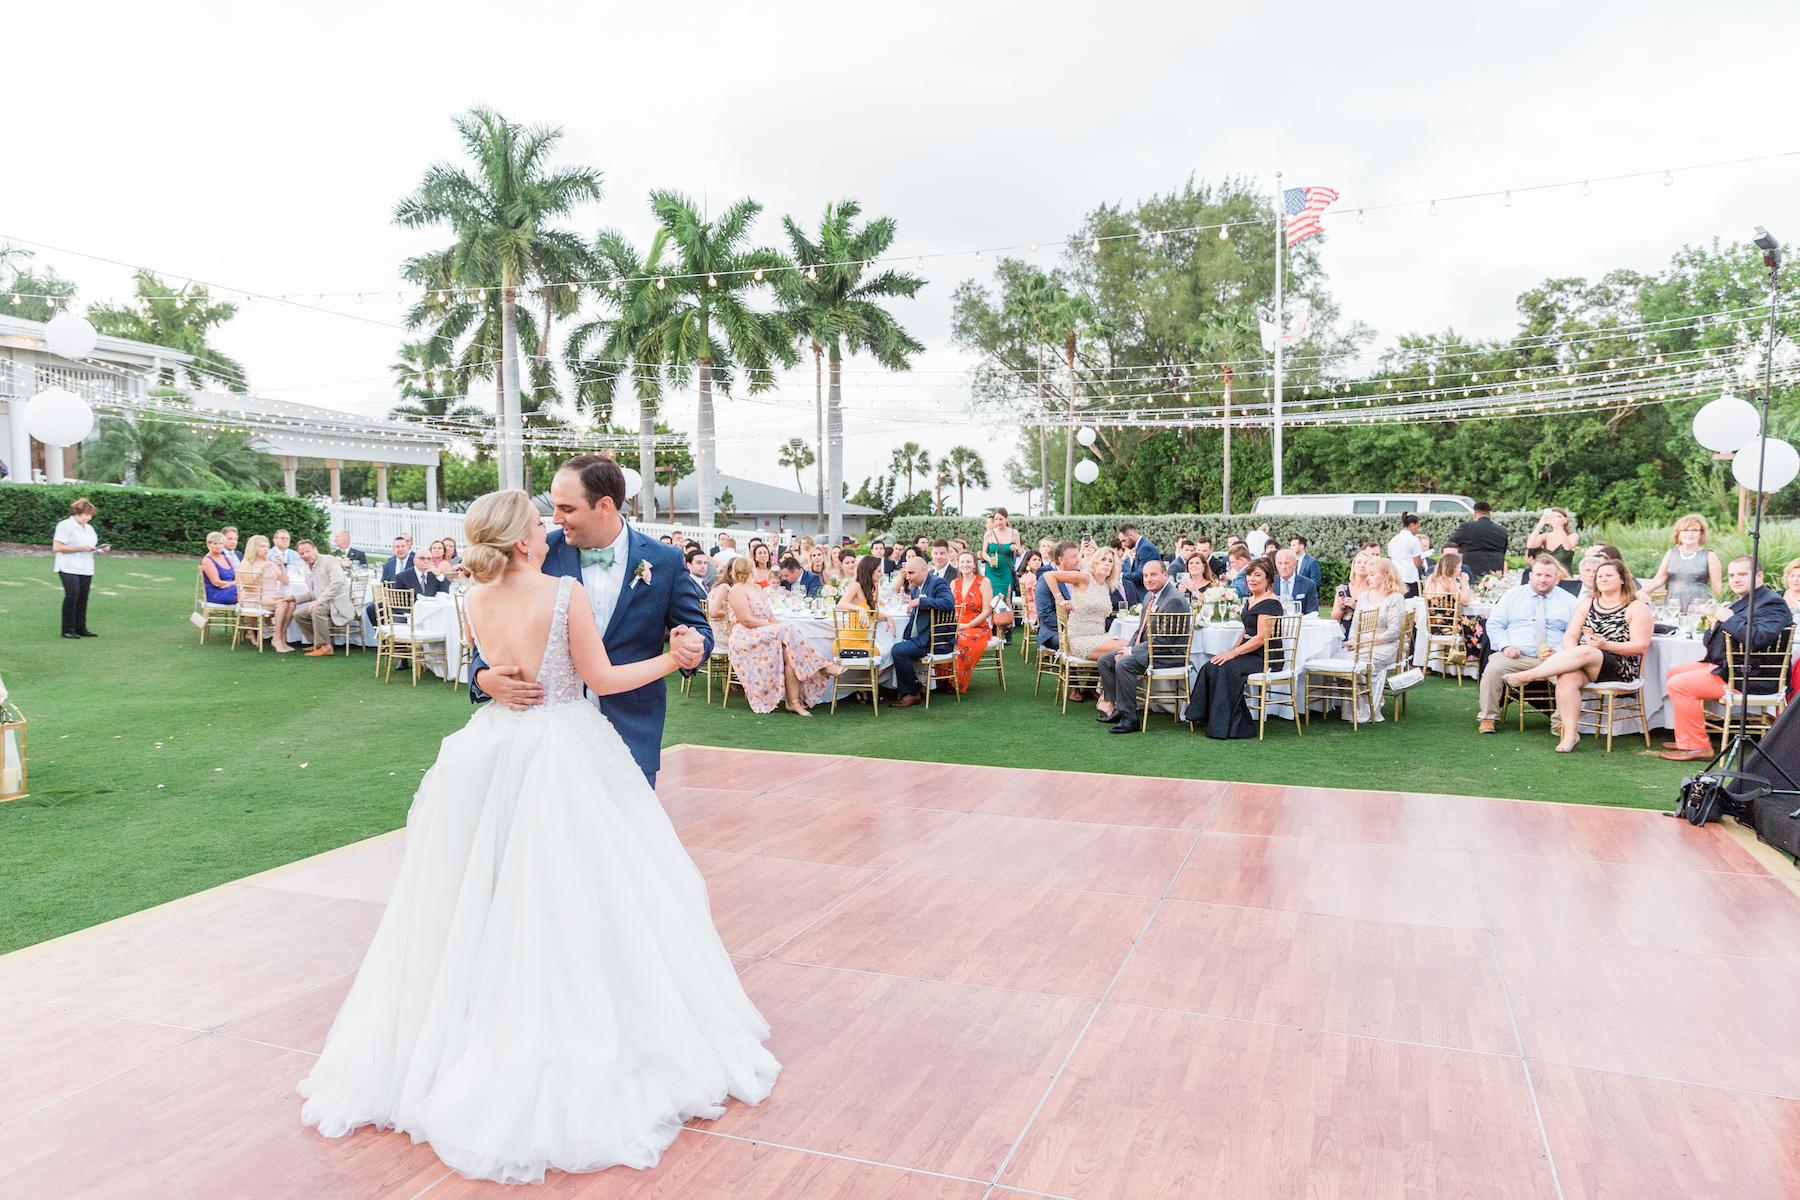 Bride and Groom Wedding First Dance | Musicians Bay Kings Band | Sarasota Wedding Venue The Resort at Longboat Key Club